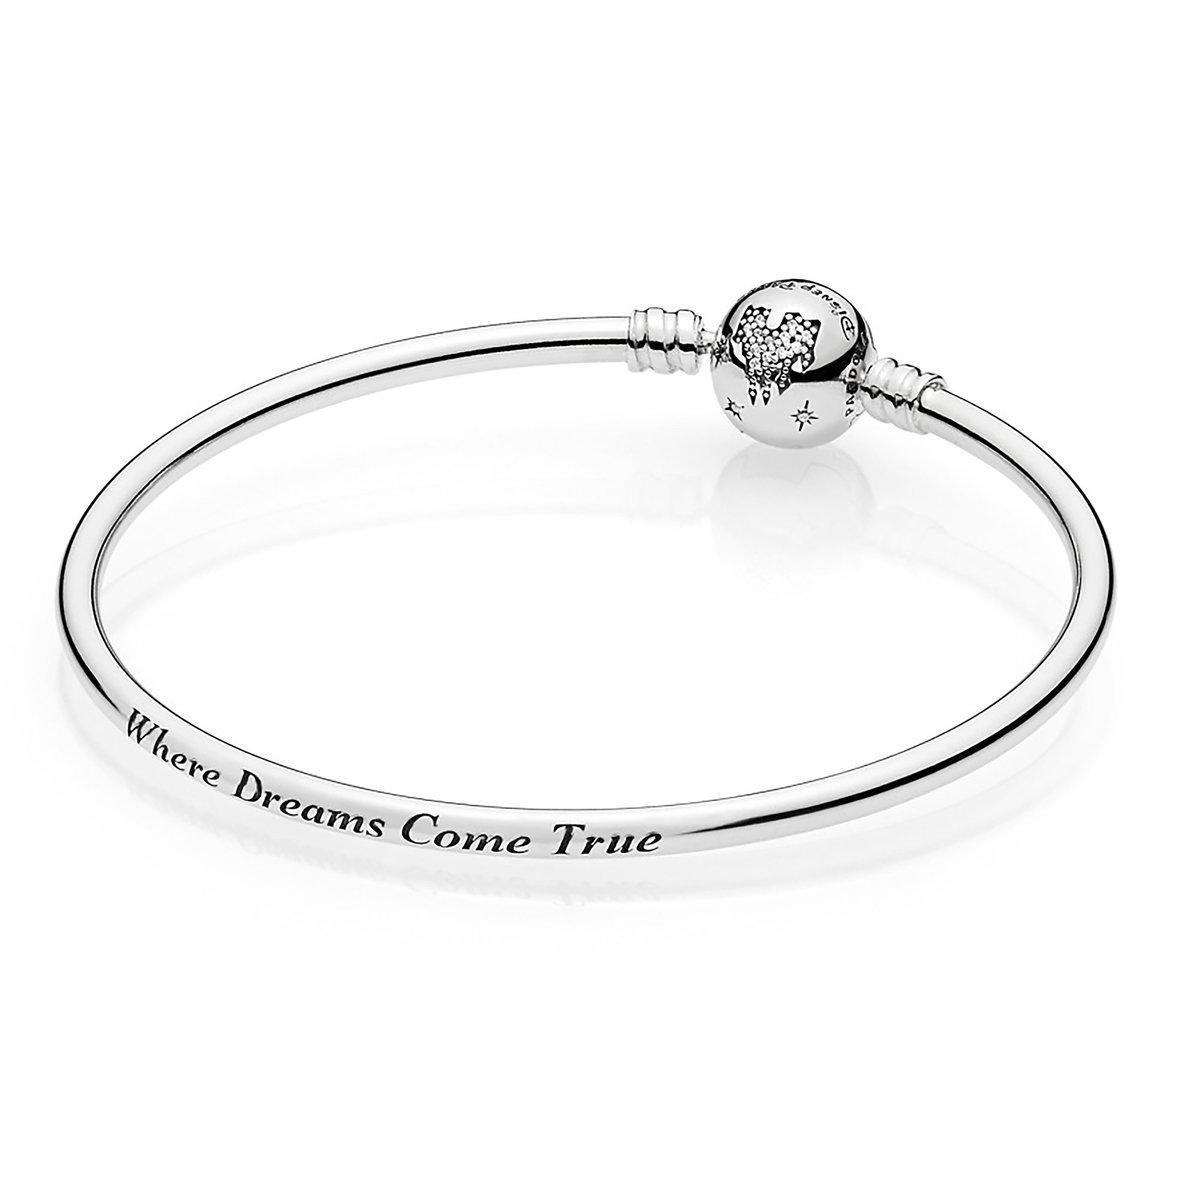 save off latest discount exquisite style Disney Pandora Bangle - Fantasyland Castle Bracelet - 7.5